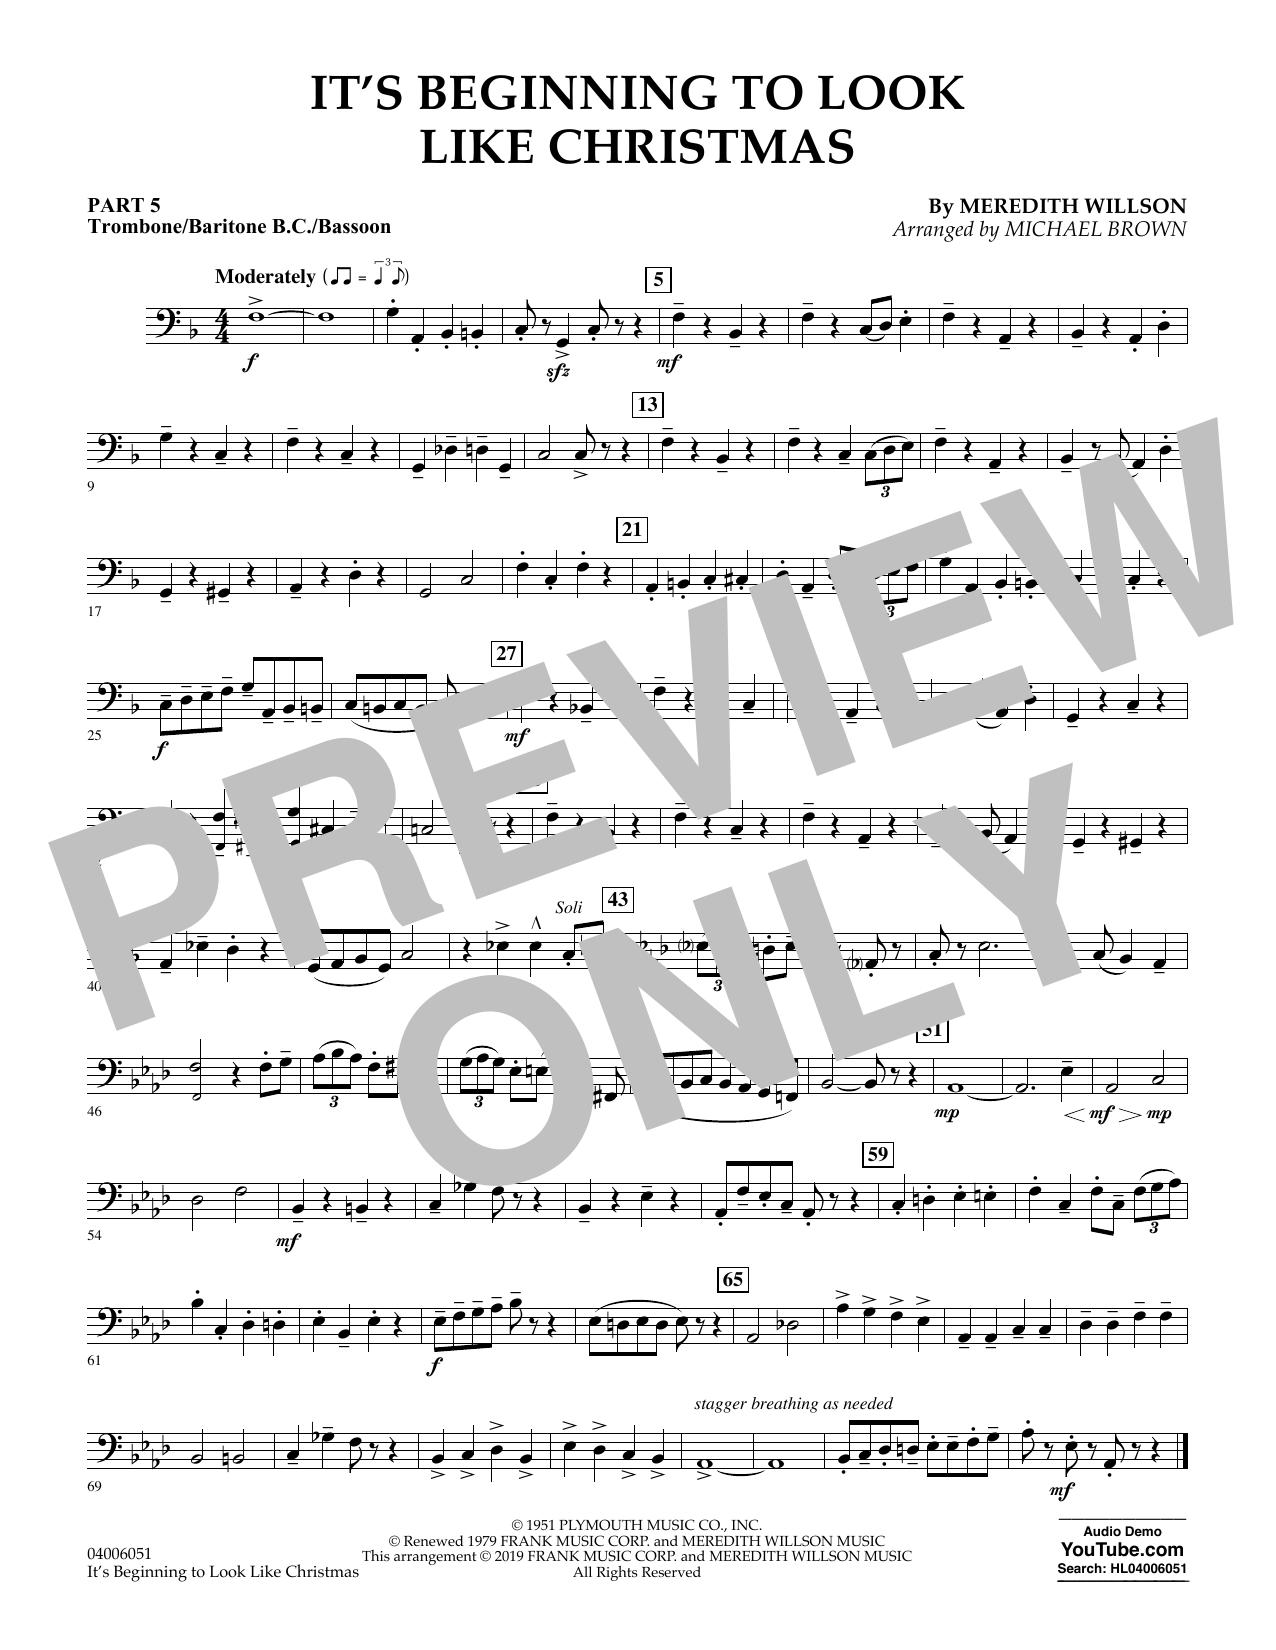 It's Beginning to Look Like Christmas (arr. Michael Brown) - Pt.5 - Trombone/Bar. B.C./Bsn. (Concert Band: Flex-Band)